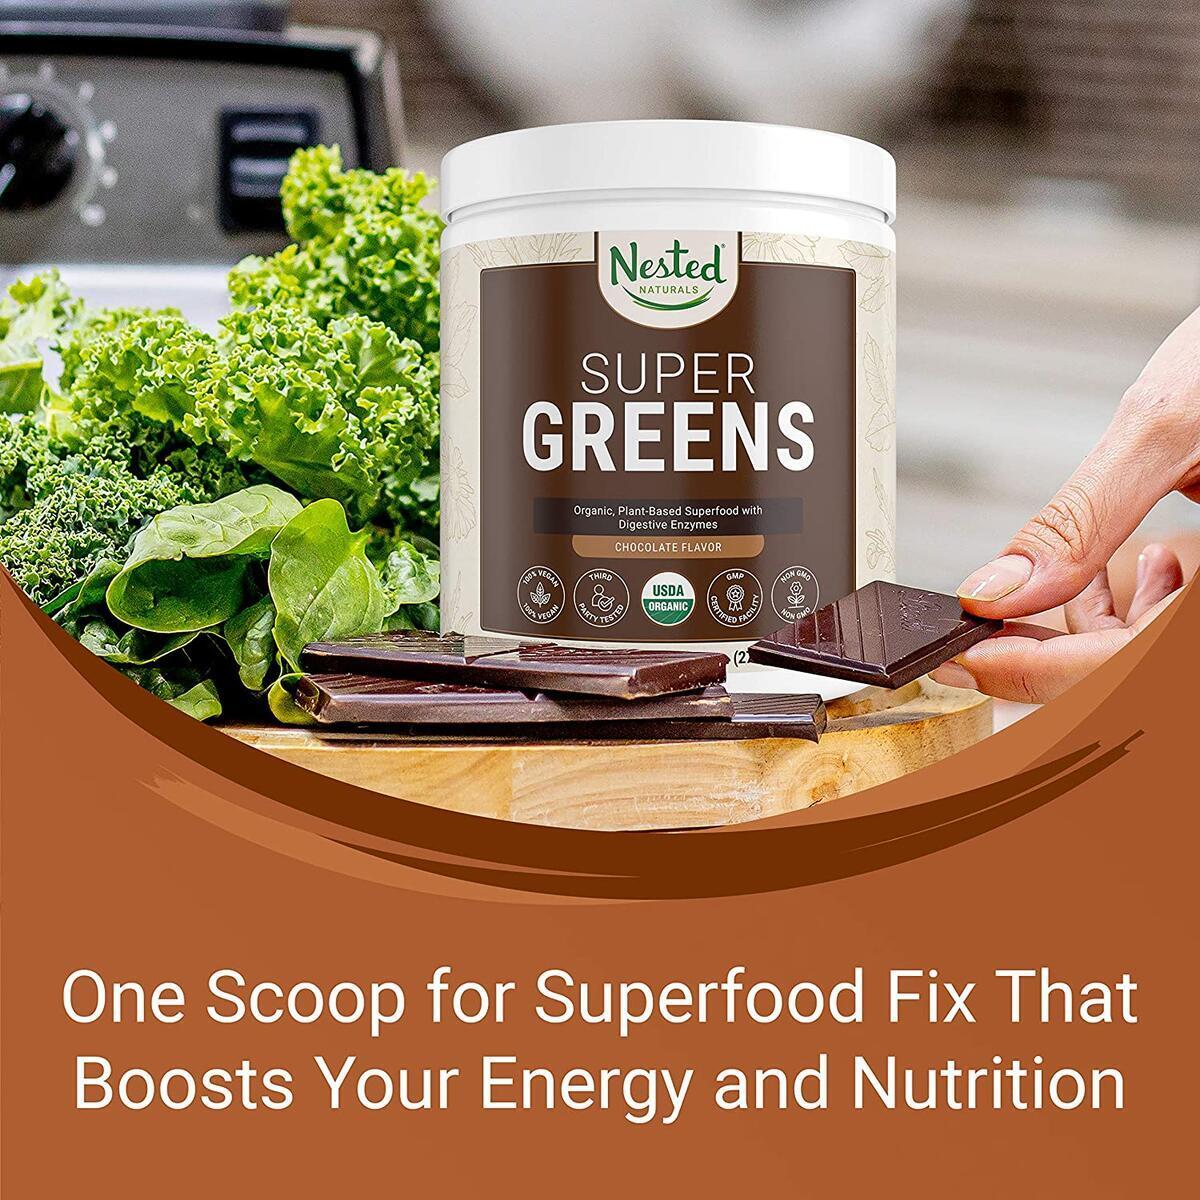 Nested Naturals Super Greens Chocolate   100% USDA Organic Non-GMO Vegan Supplement   20+ Whole Foods (Wheat Grass, Spirulina, Chlorella), Probiotics, Enzymes Smoothie Mix